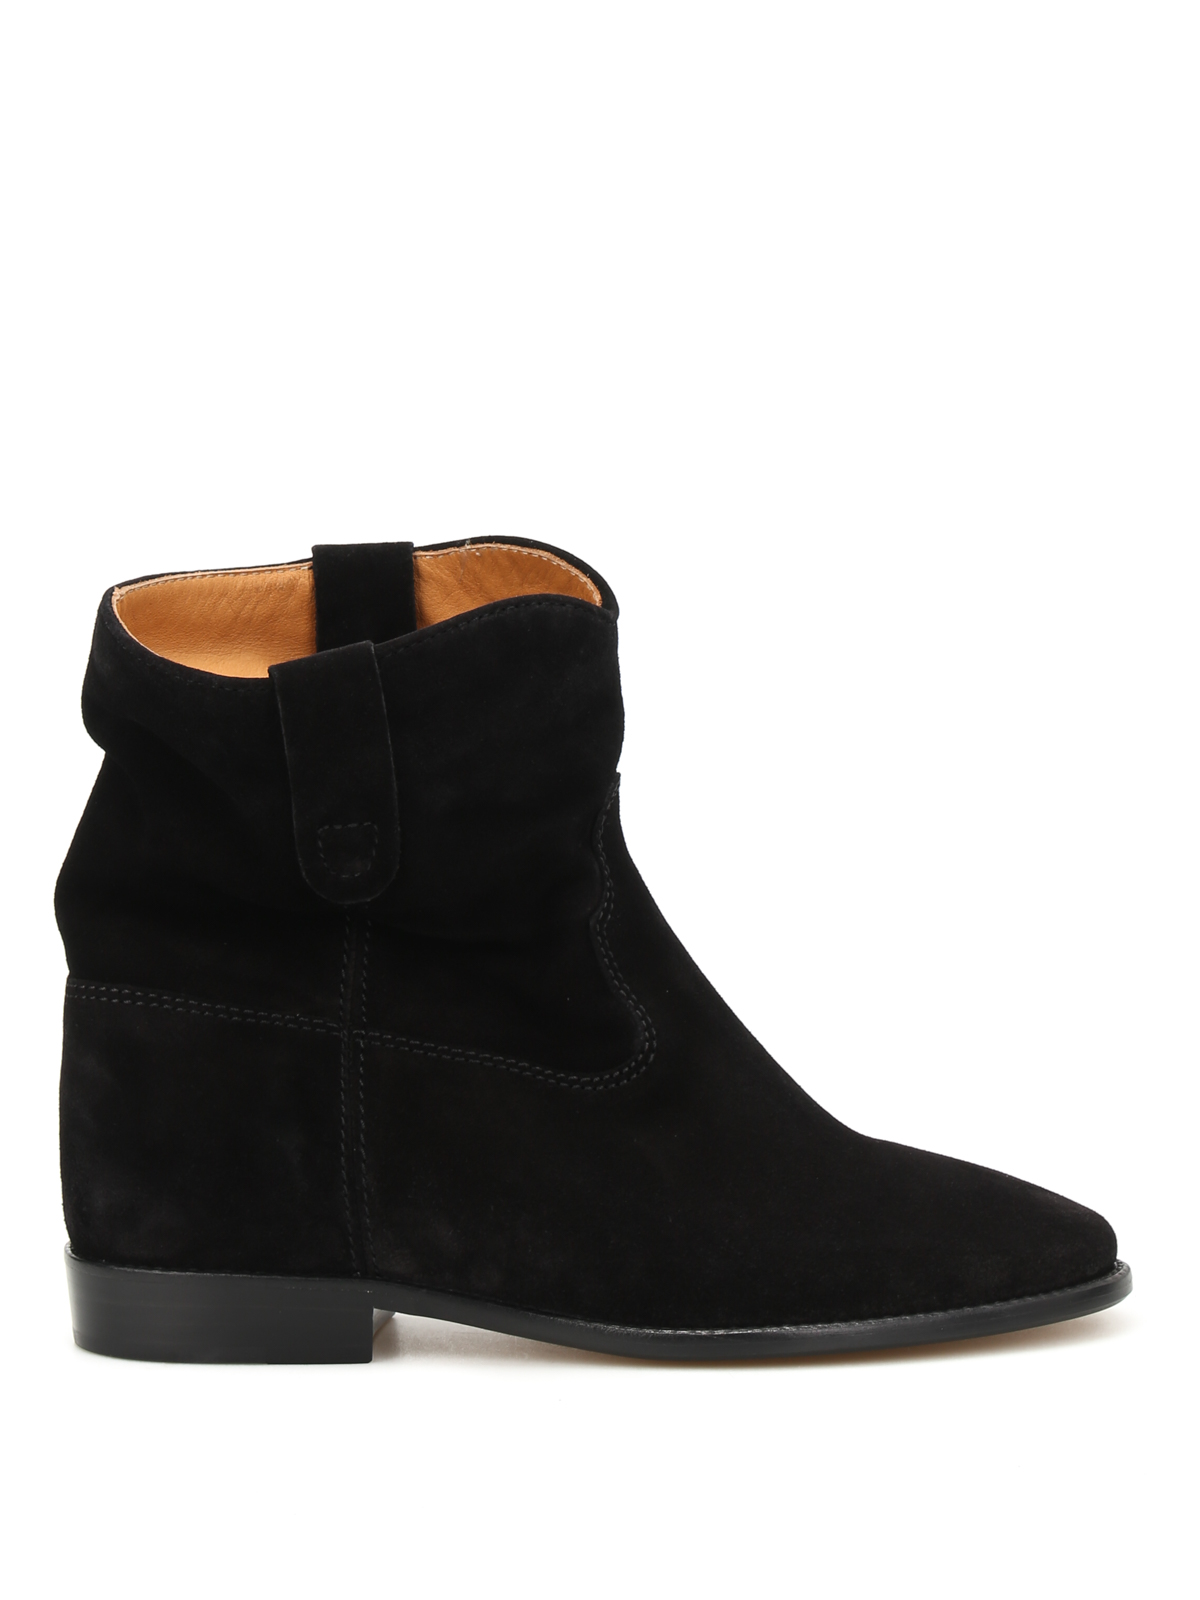 crisi suede ankle boots by isabel marant ankle boots ikrix. Black Bedroom Furniture Sets. Home Design Ideas